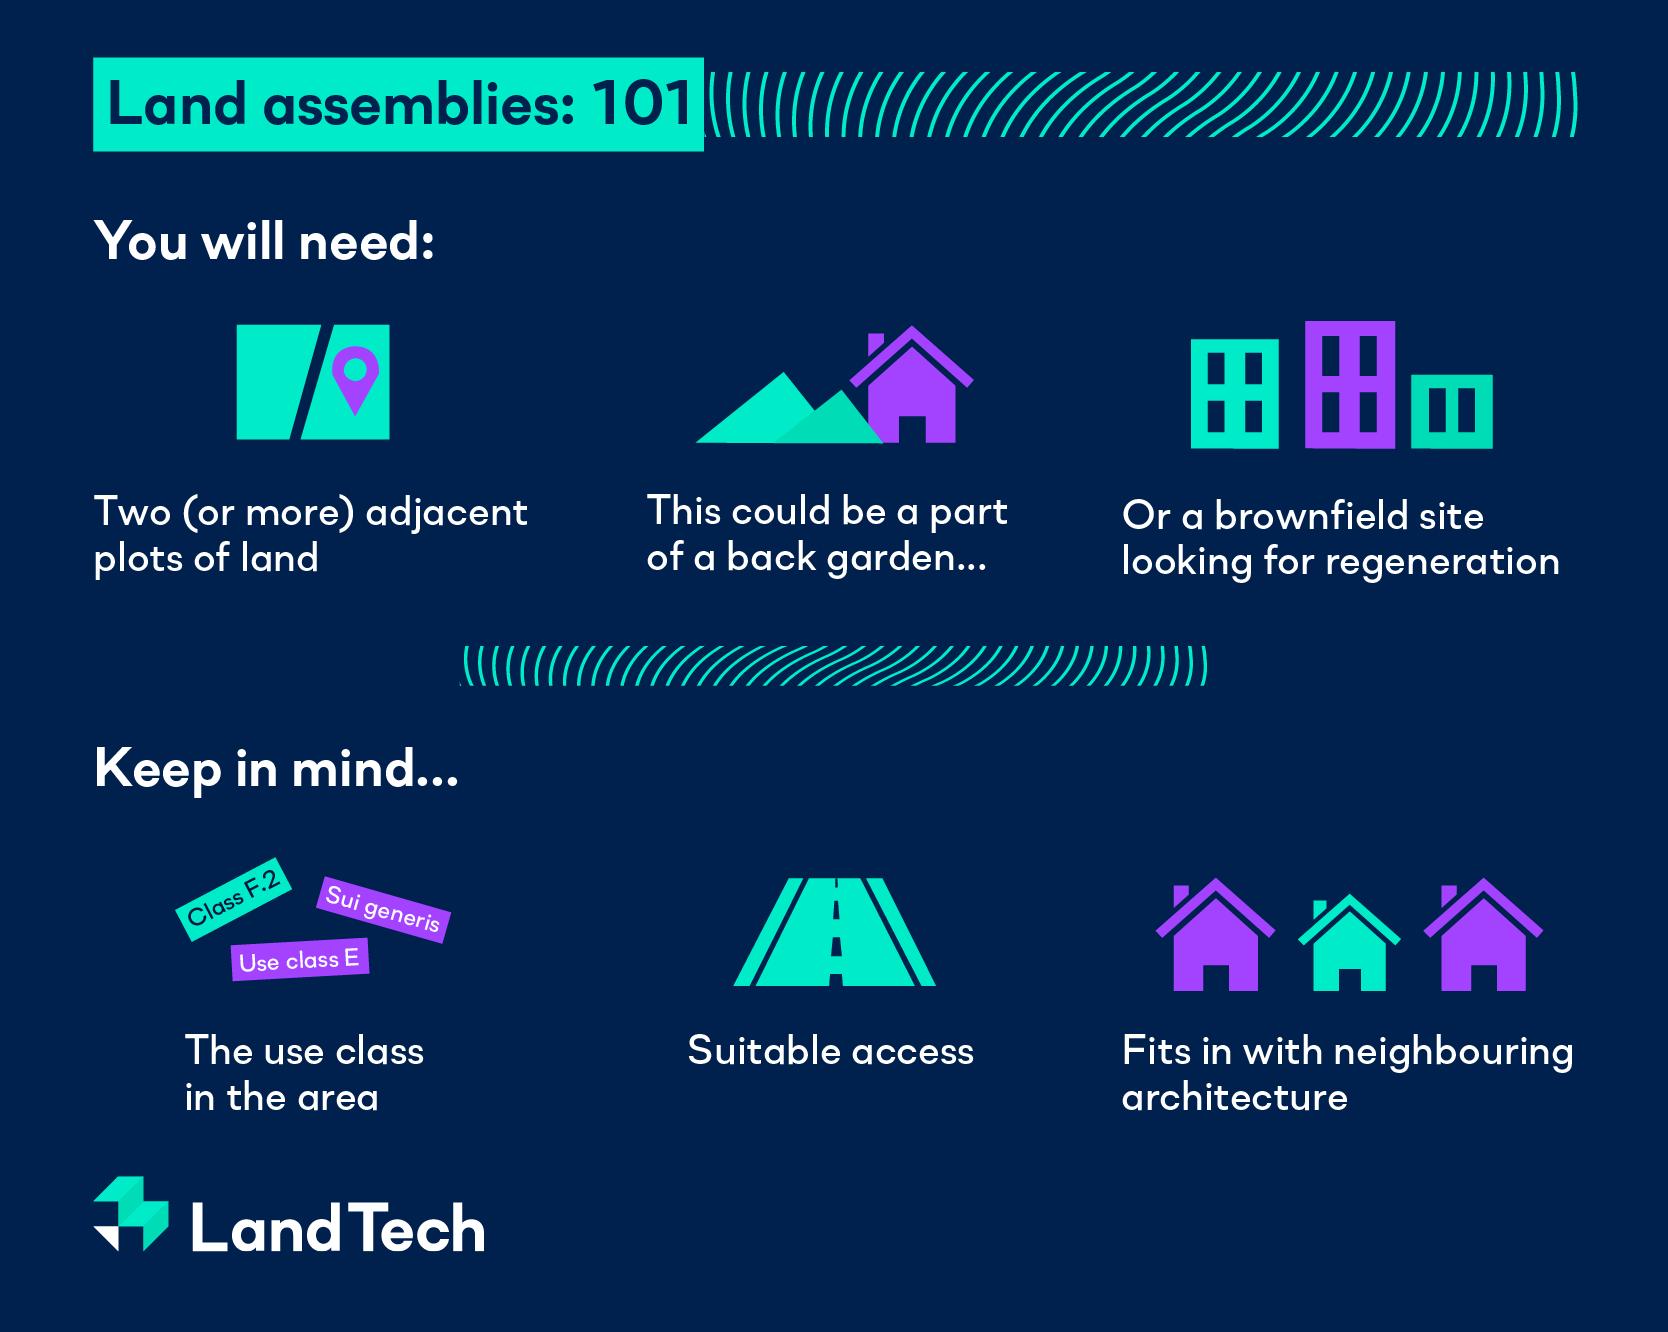 Infographic V02_Land Assemblies 101